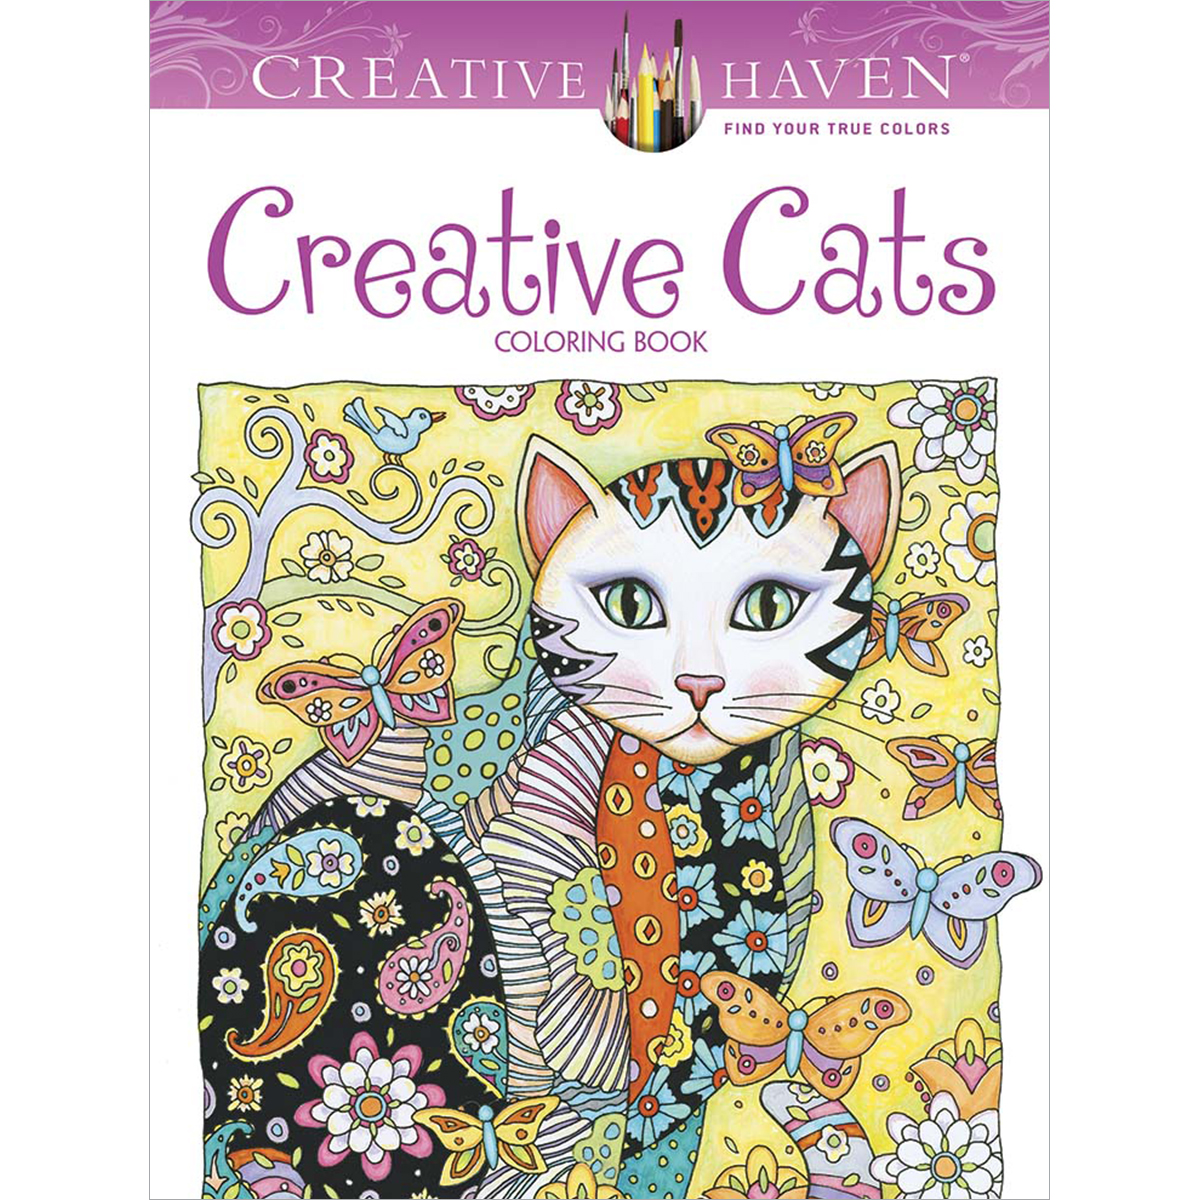 Dover Publications Creative Cats Coloring Book